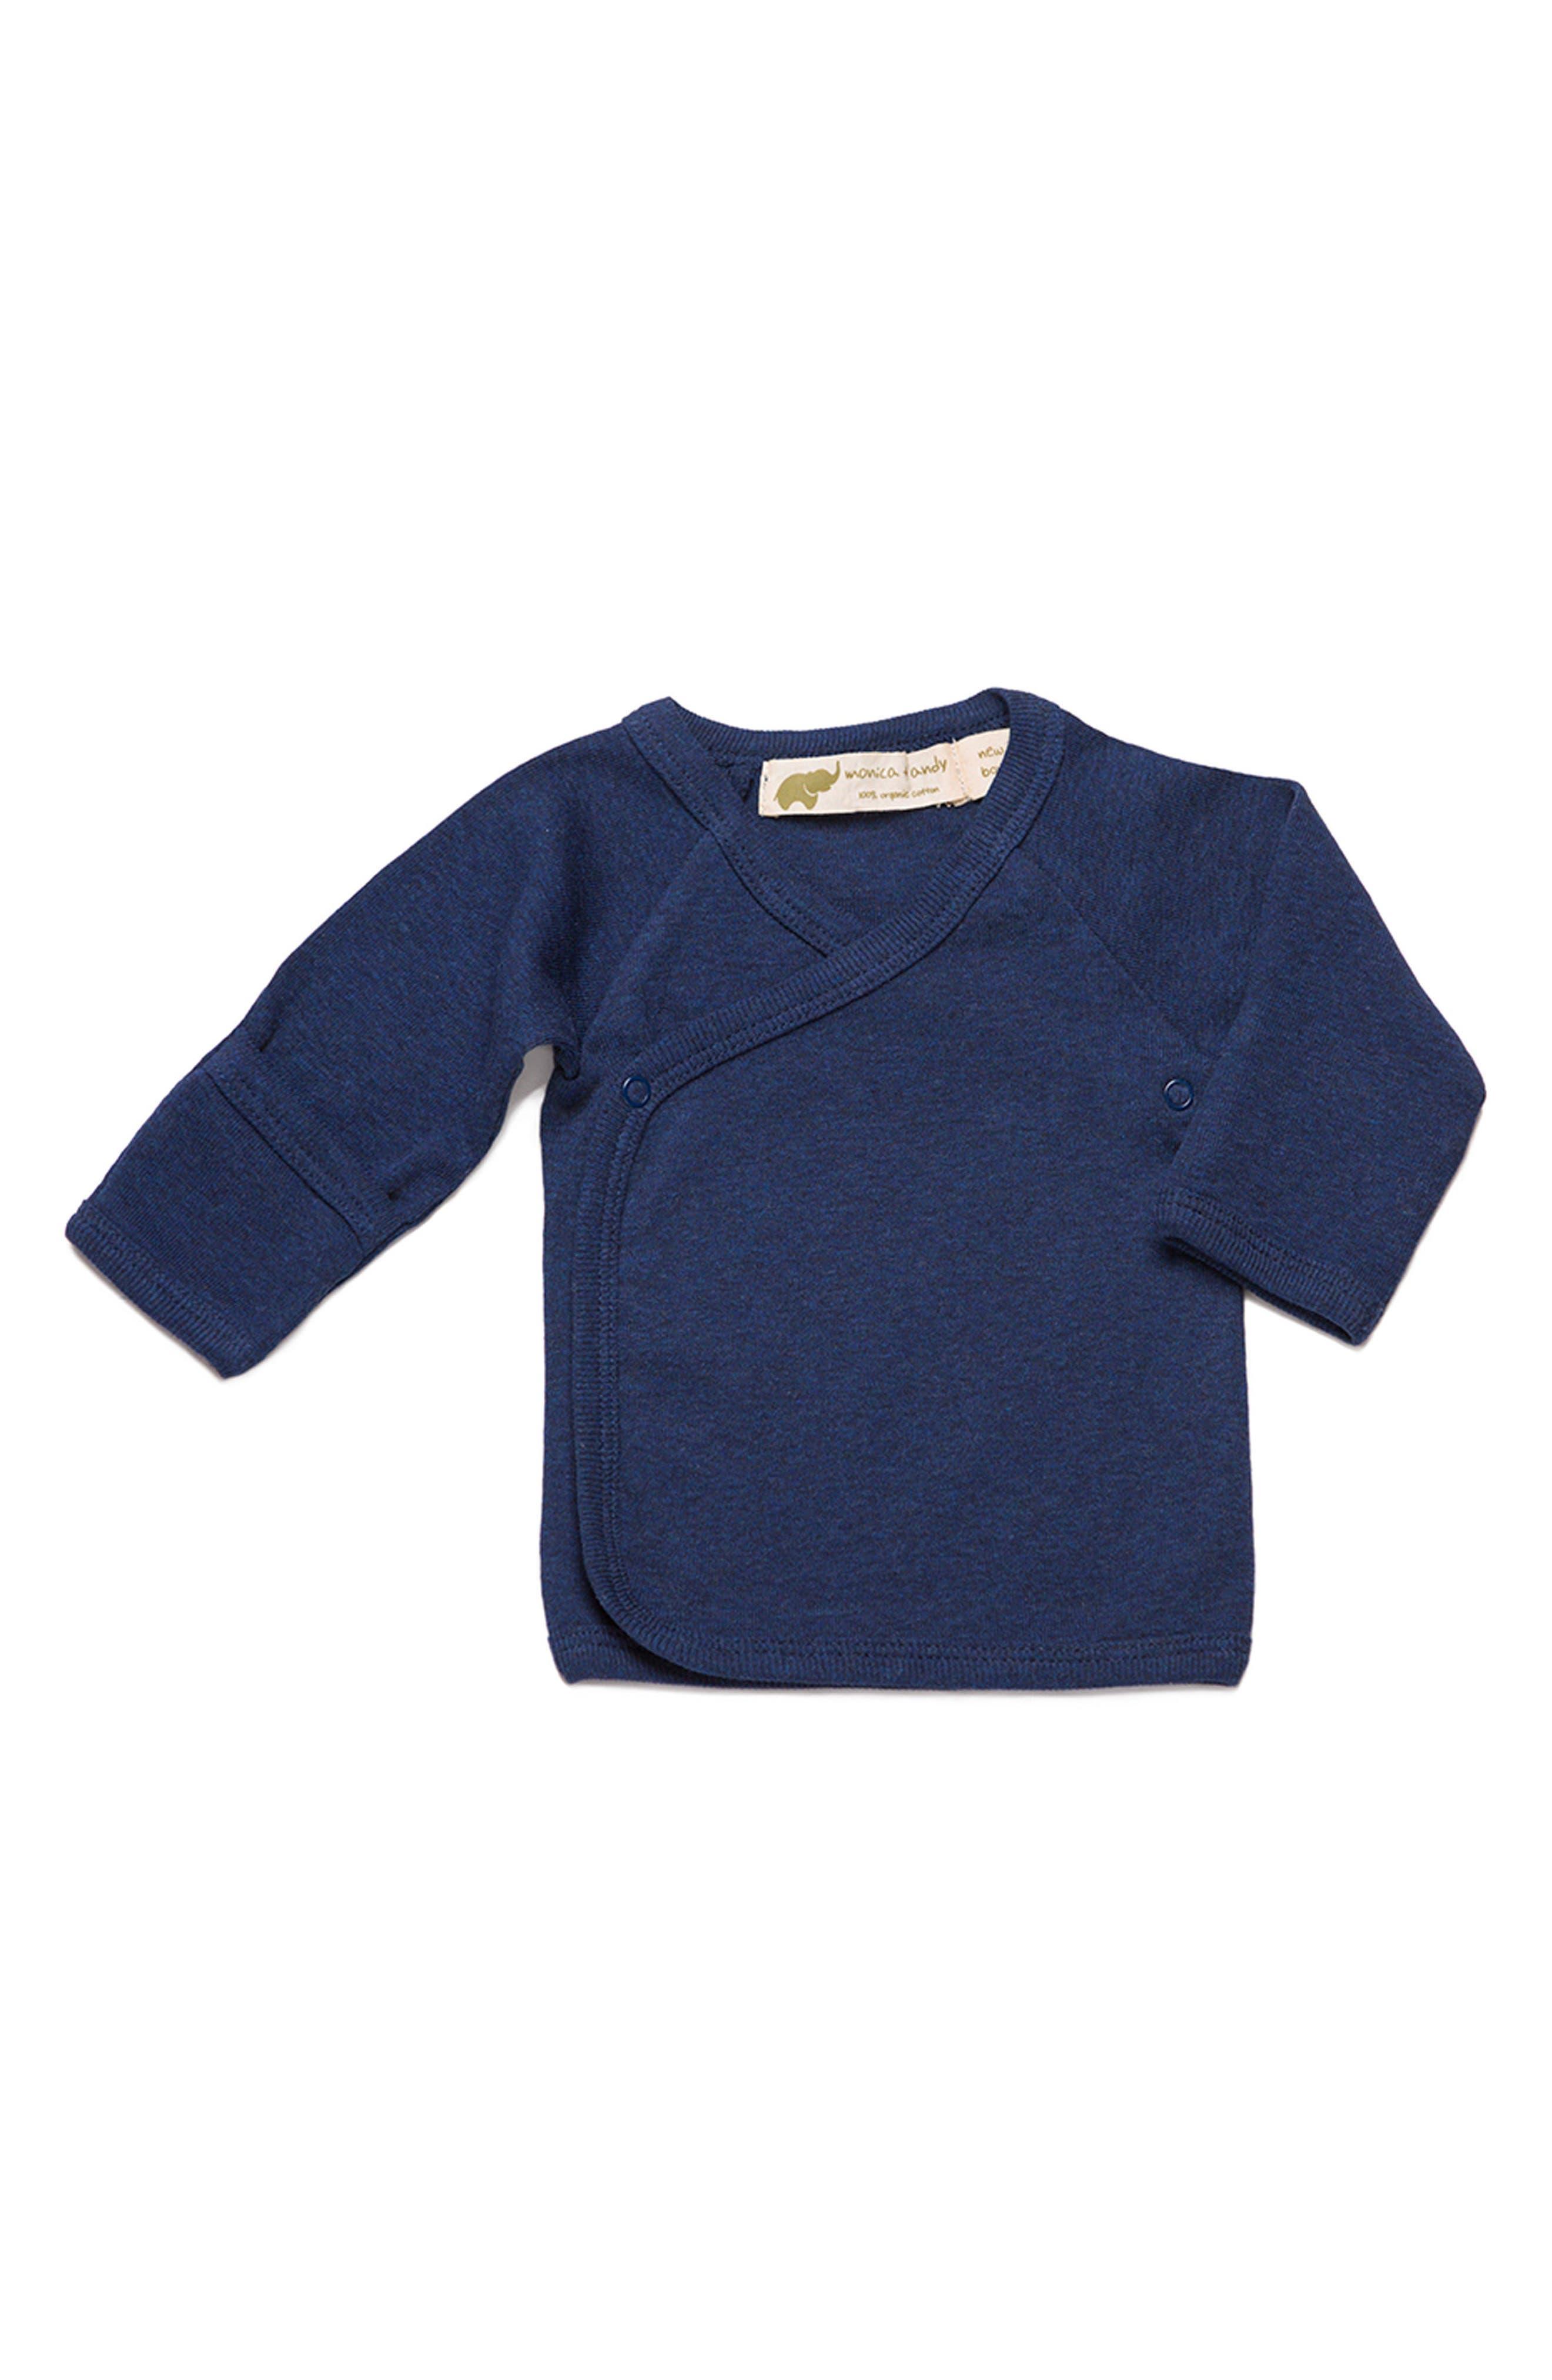 Hello Baby Organic Cotton Top,                         Main,                         color, Navy Blue  Heather